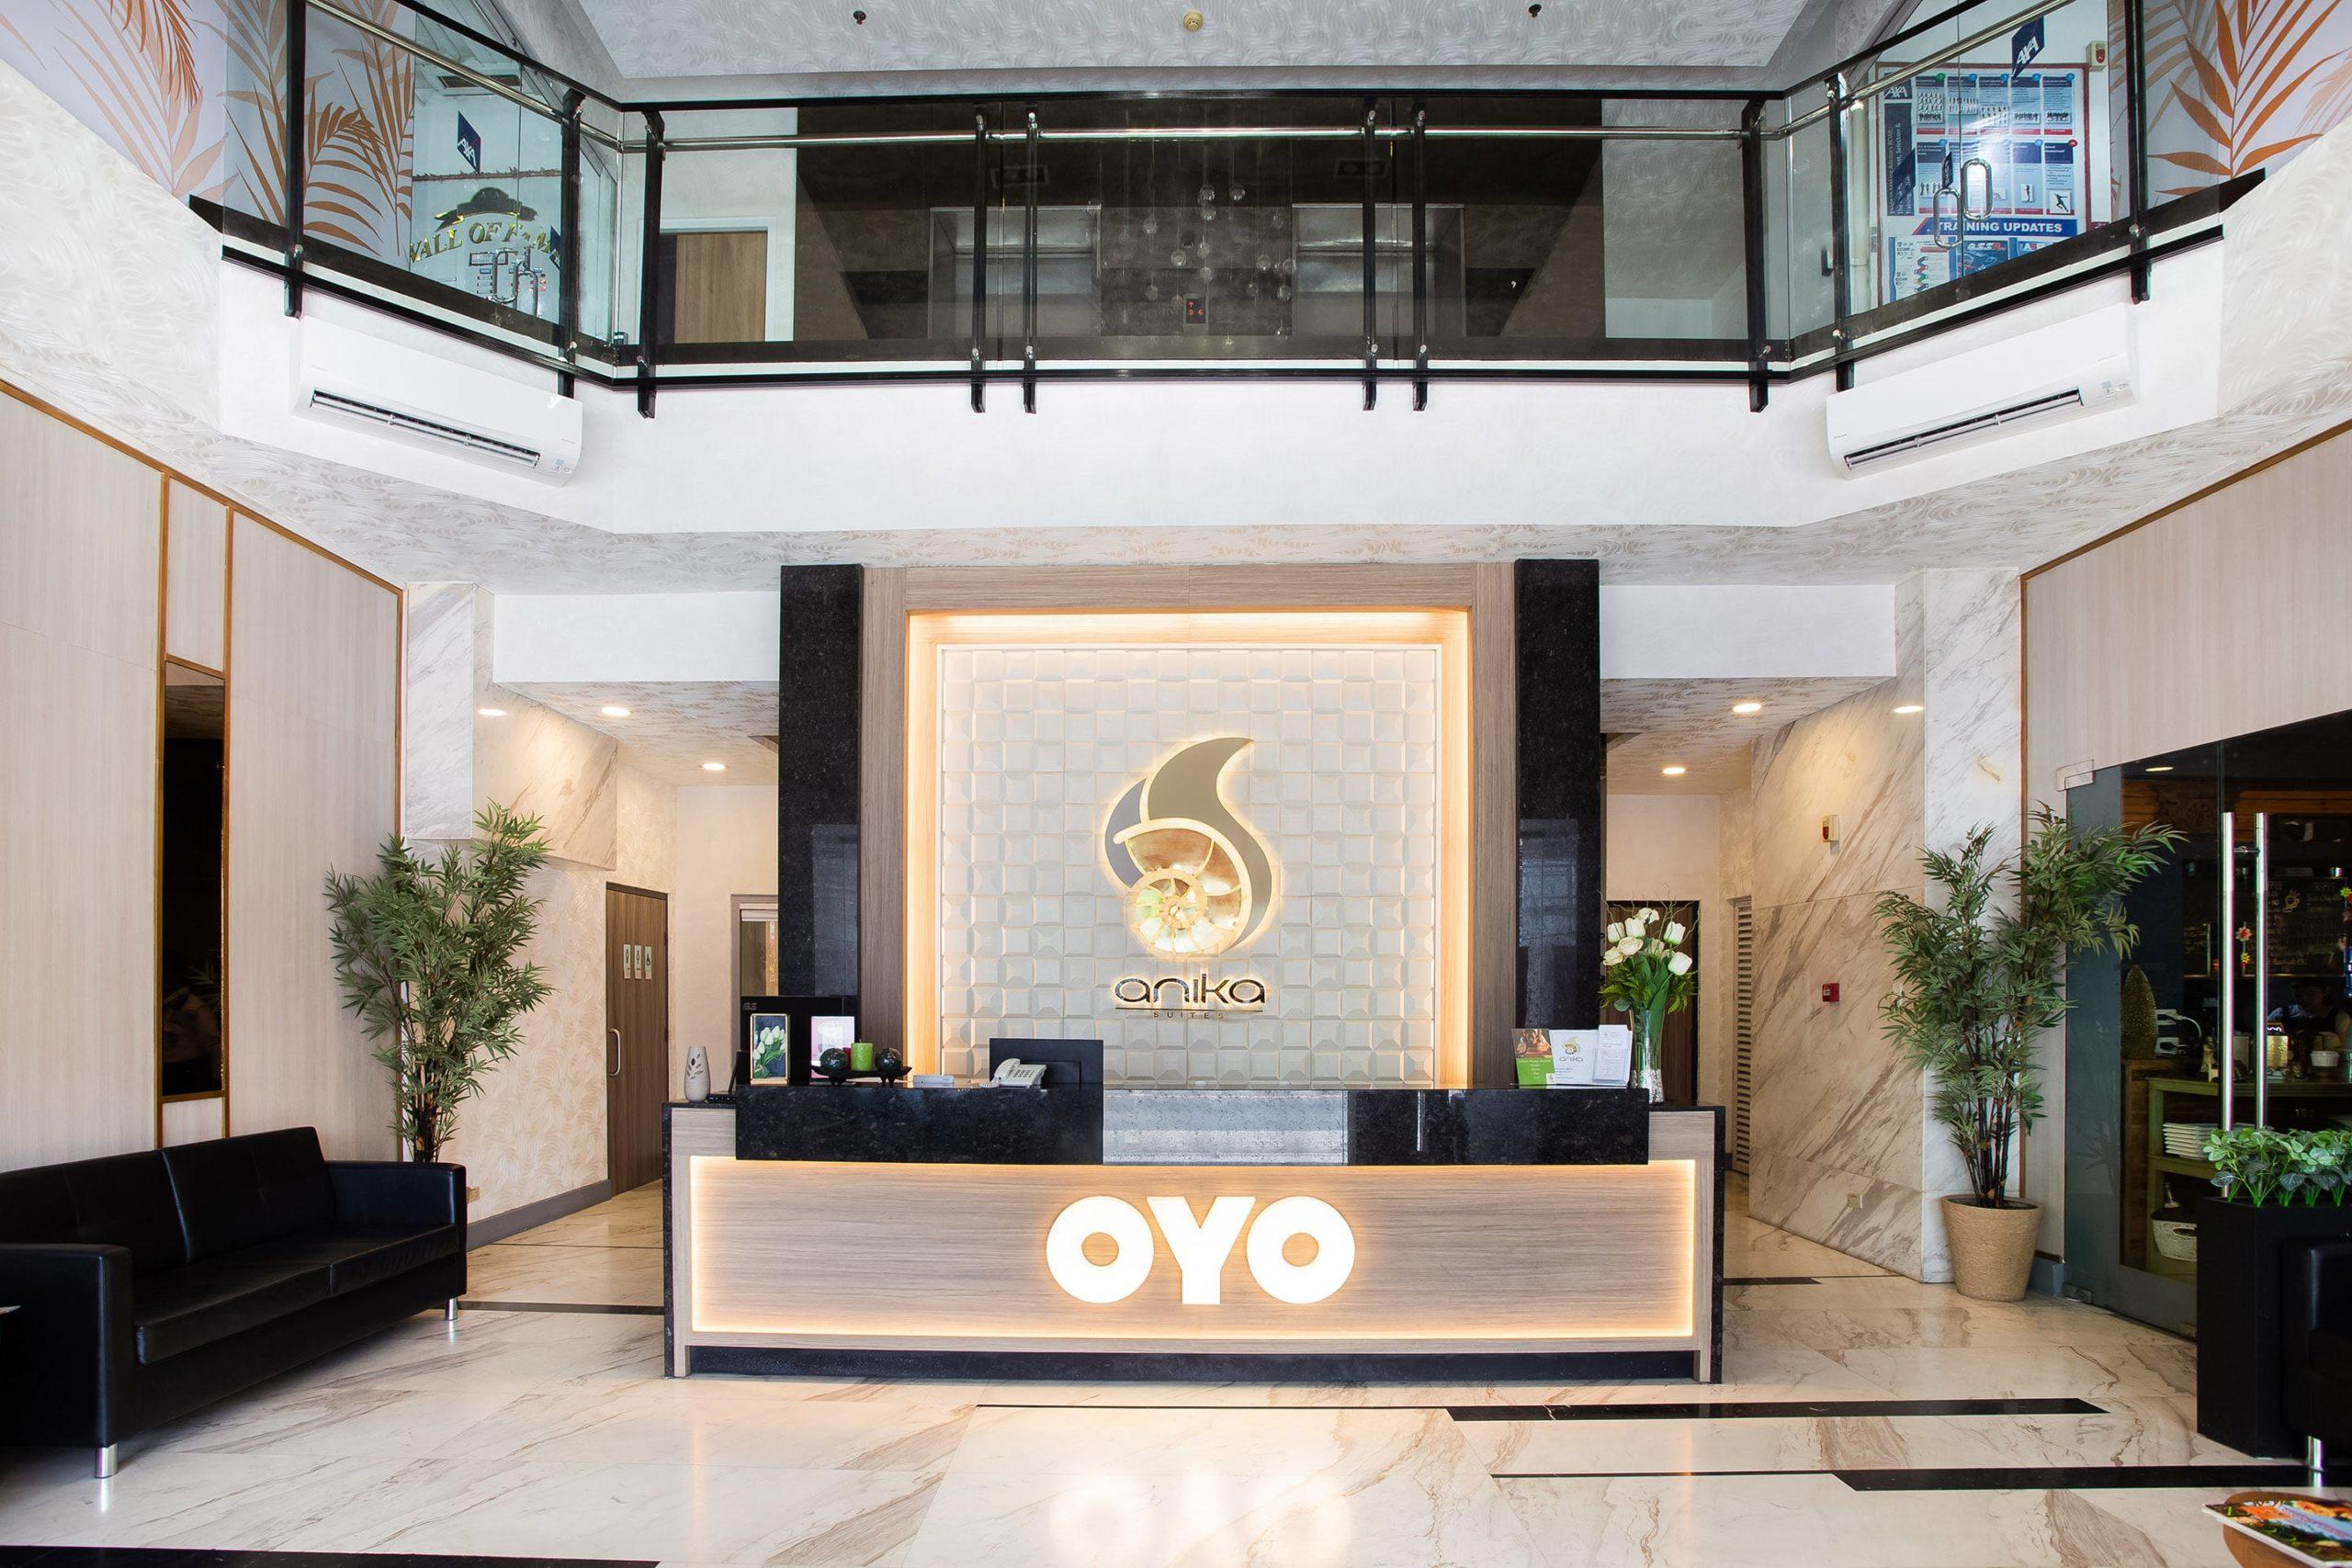 OYO Hotel, Anika Suites partner in Cebu City